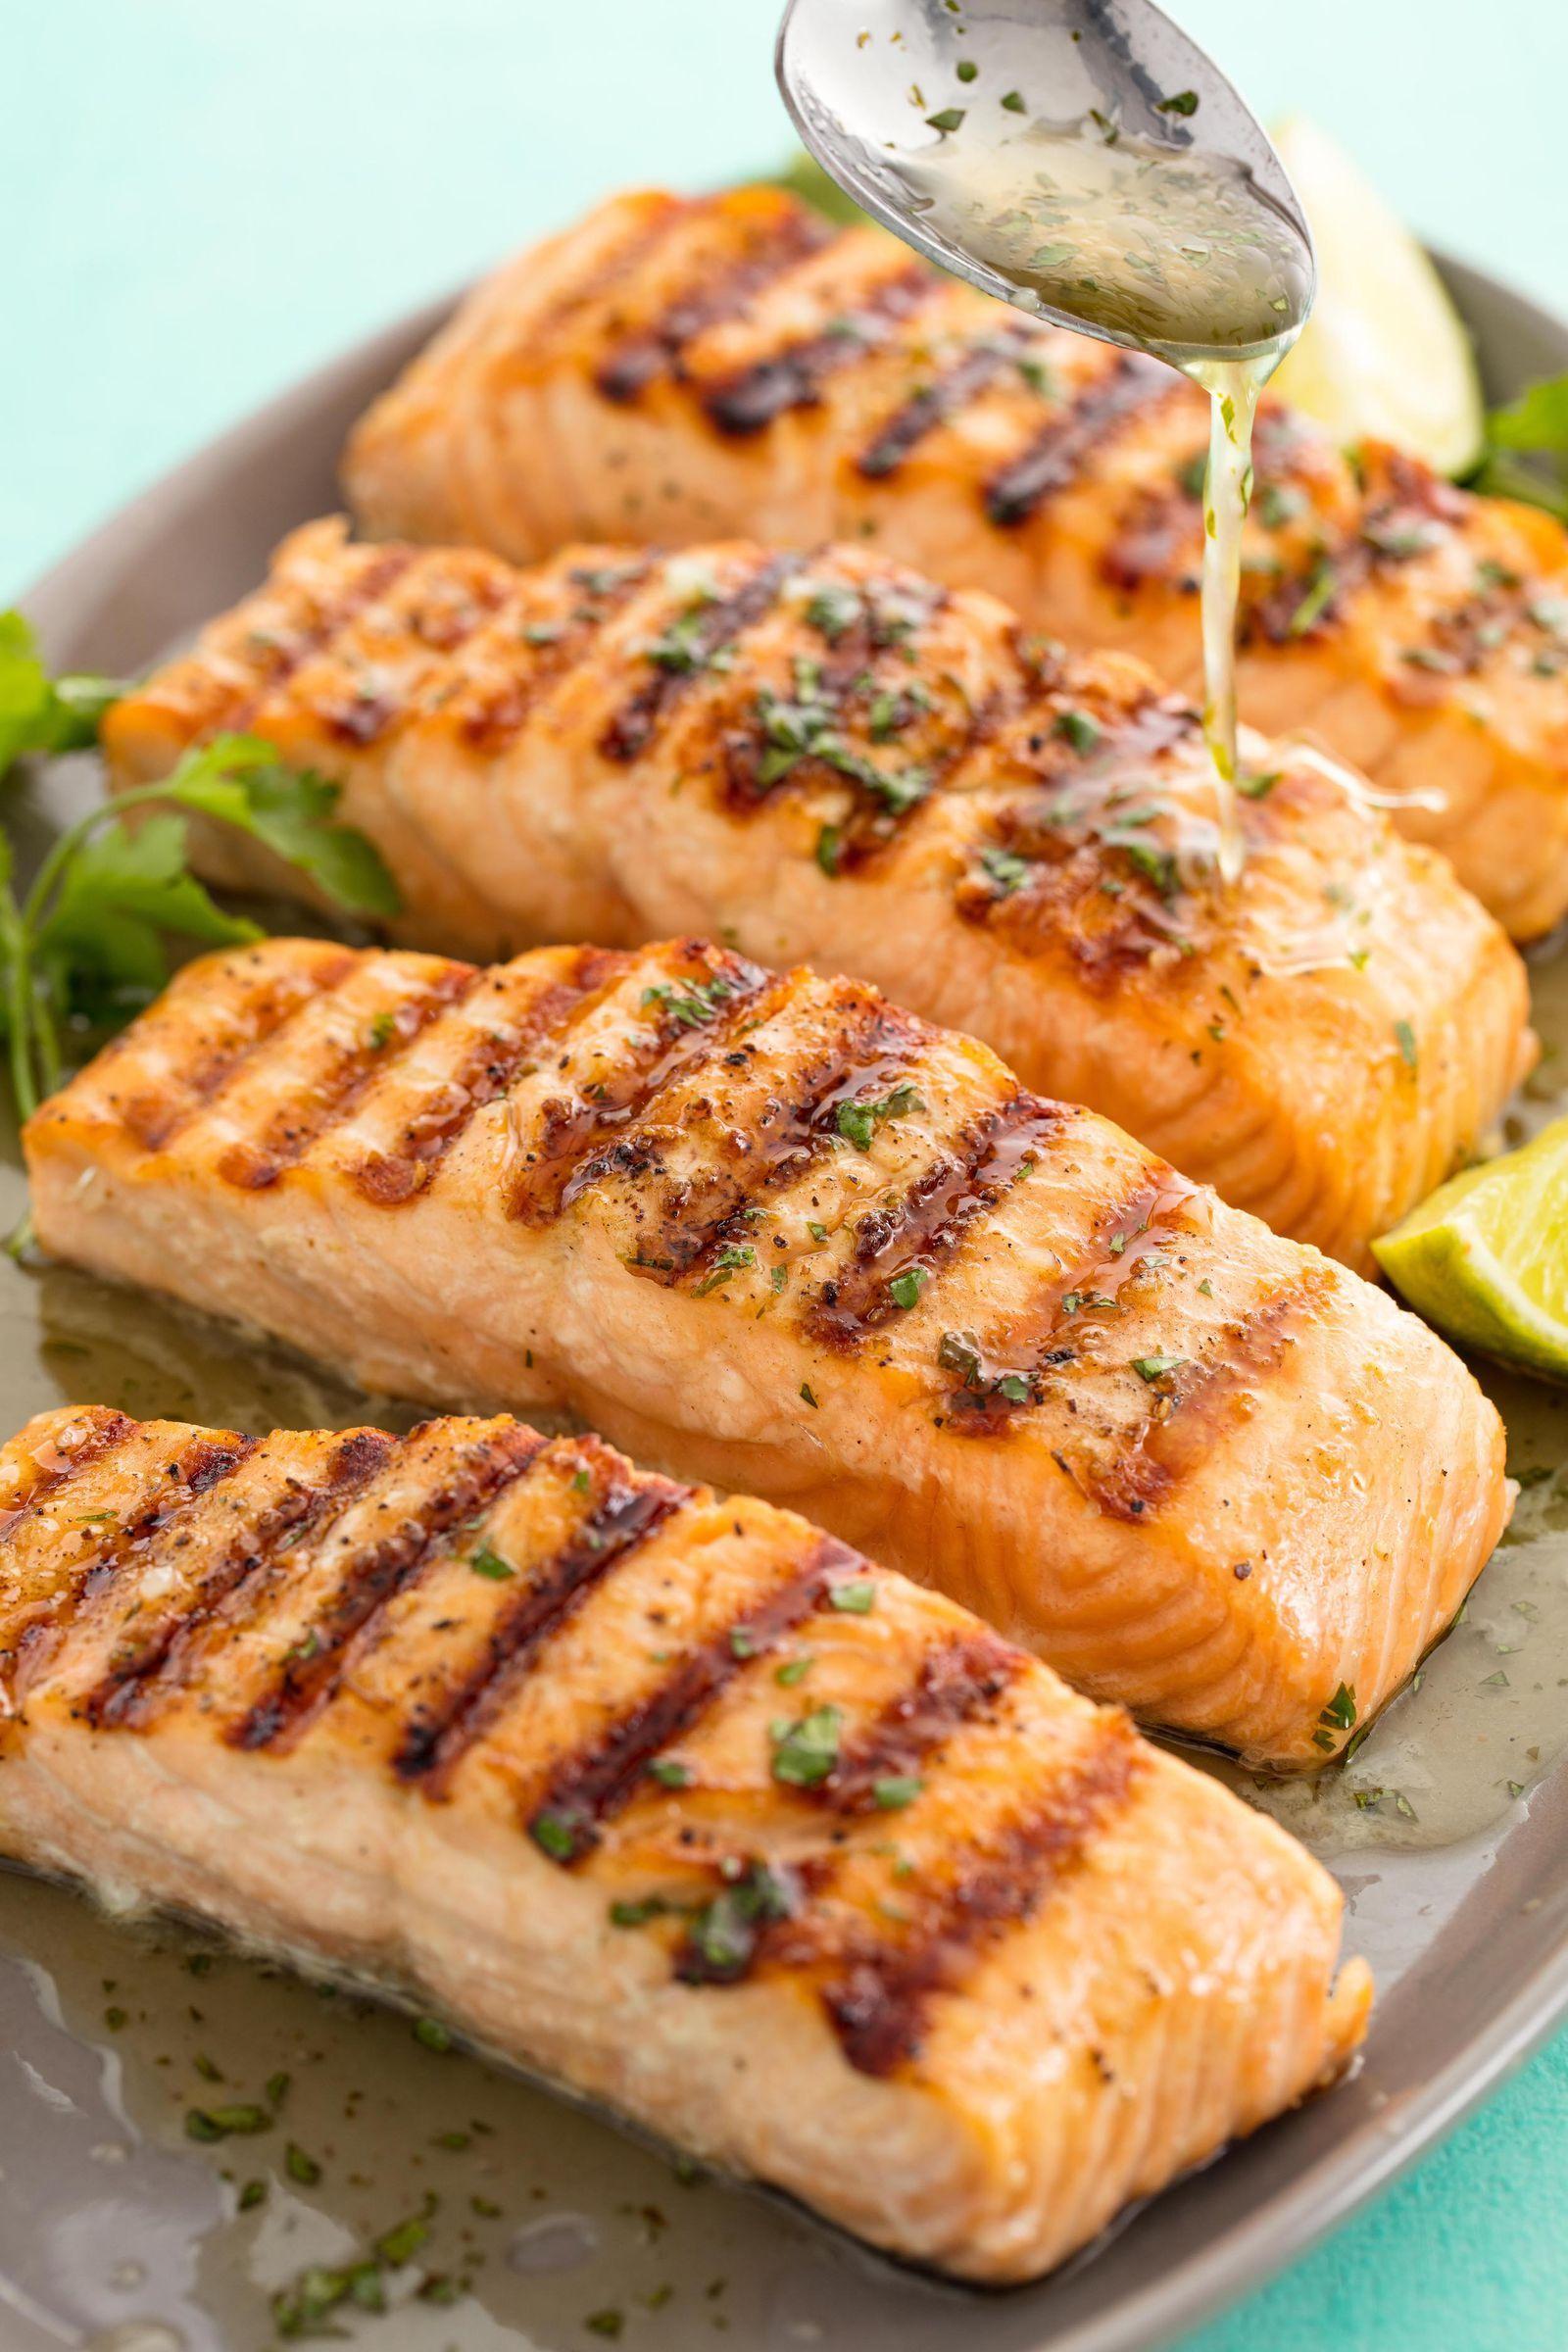 Cilantro Lime Grilled Salmon Recipe Grilled Salmon With Cilantro